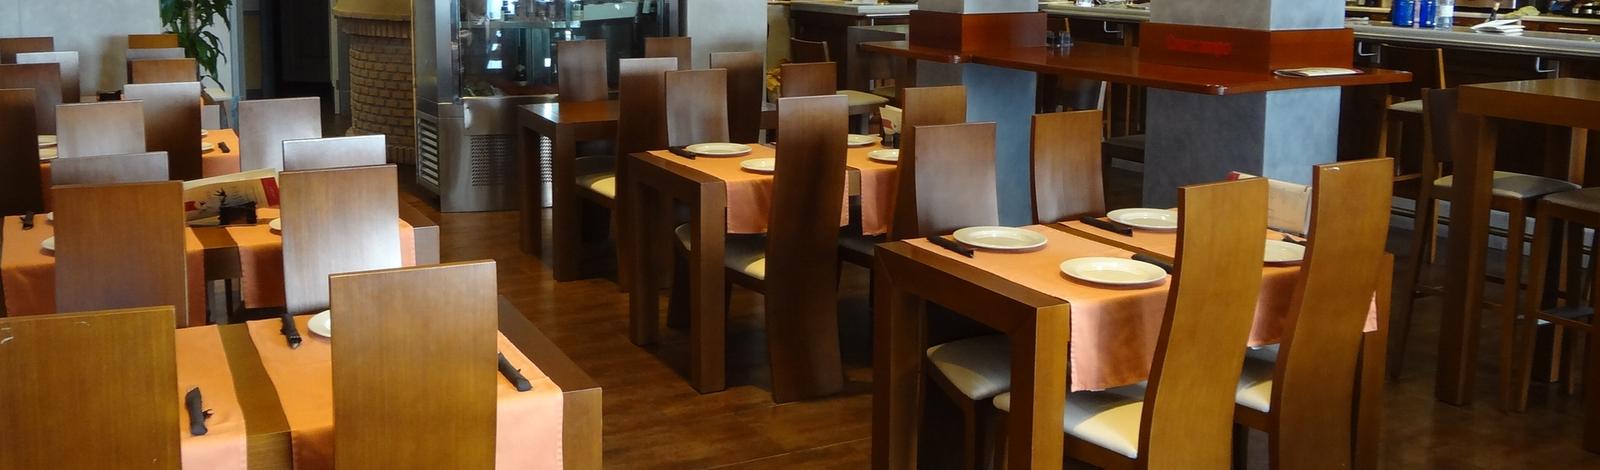 restaurante-asador-volao